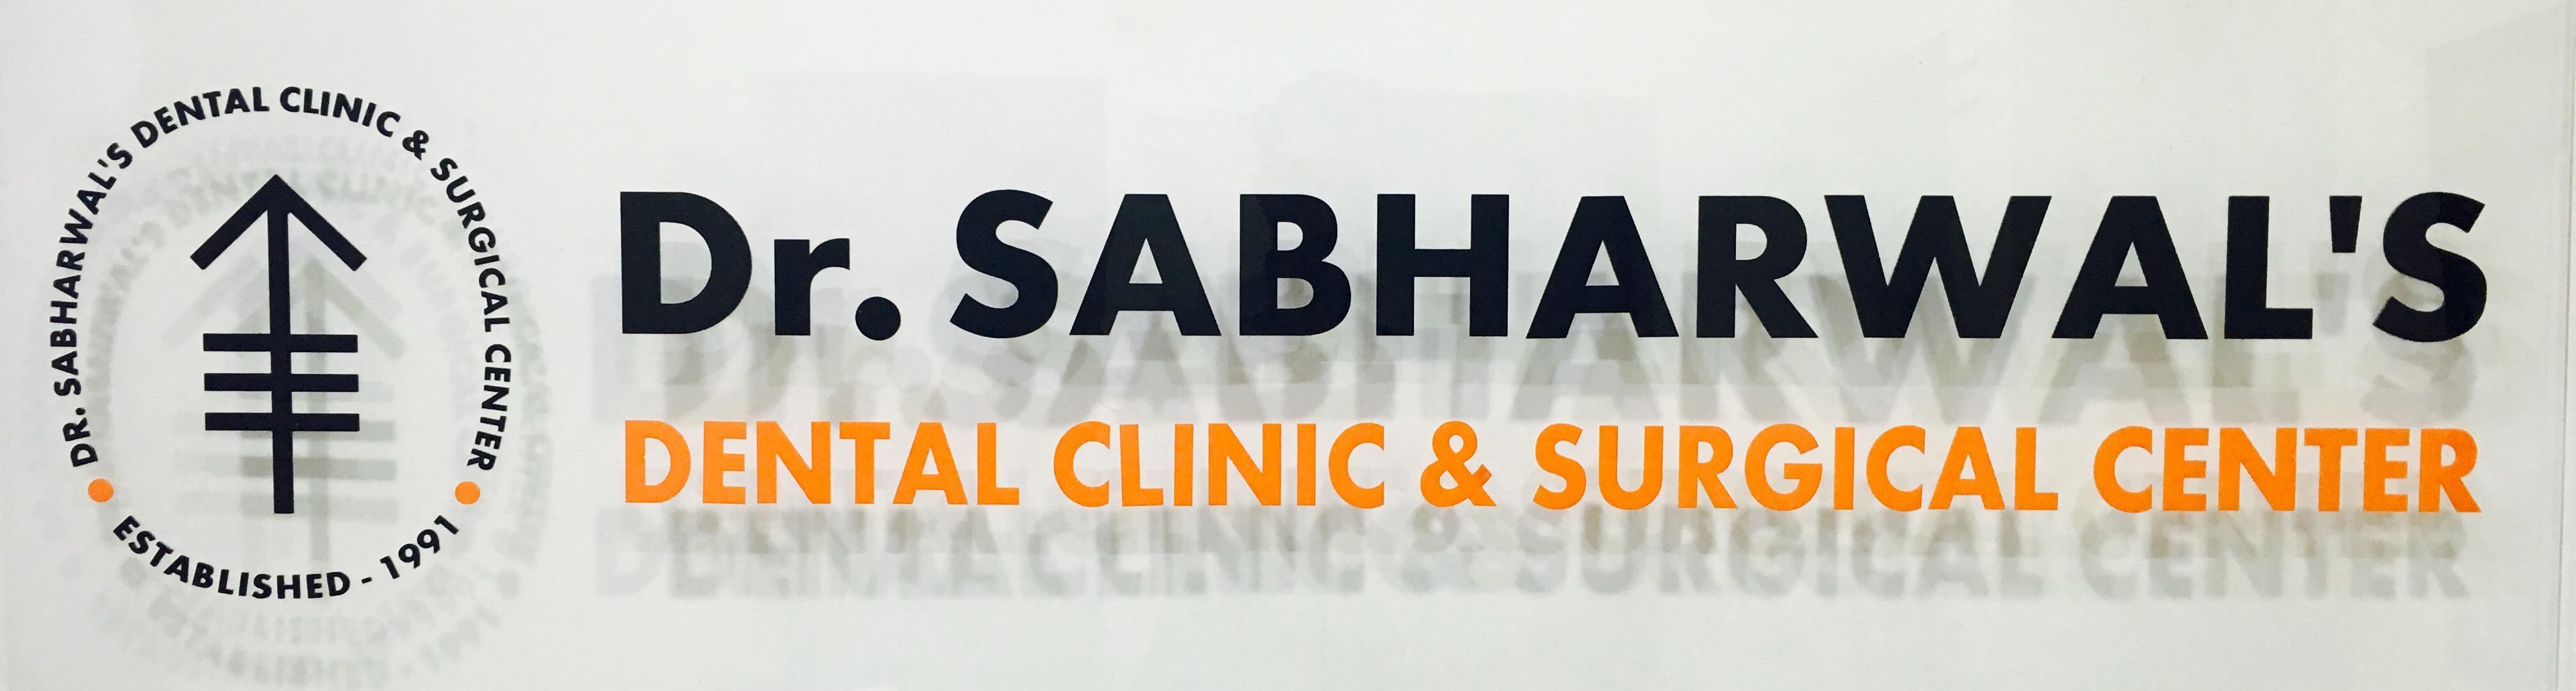 Dr. Sabharwal 's Dental Clinic & Surgical Center